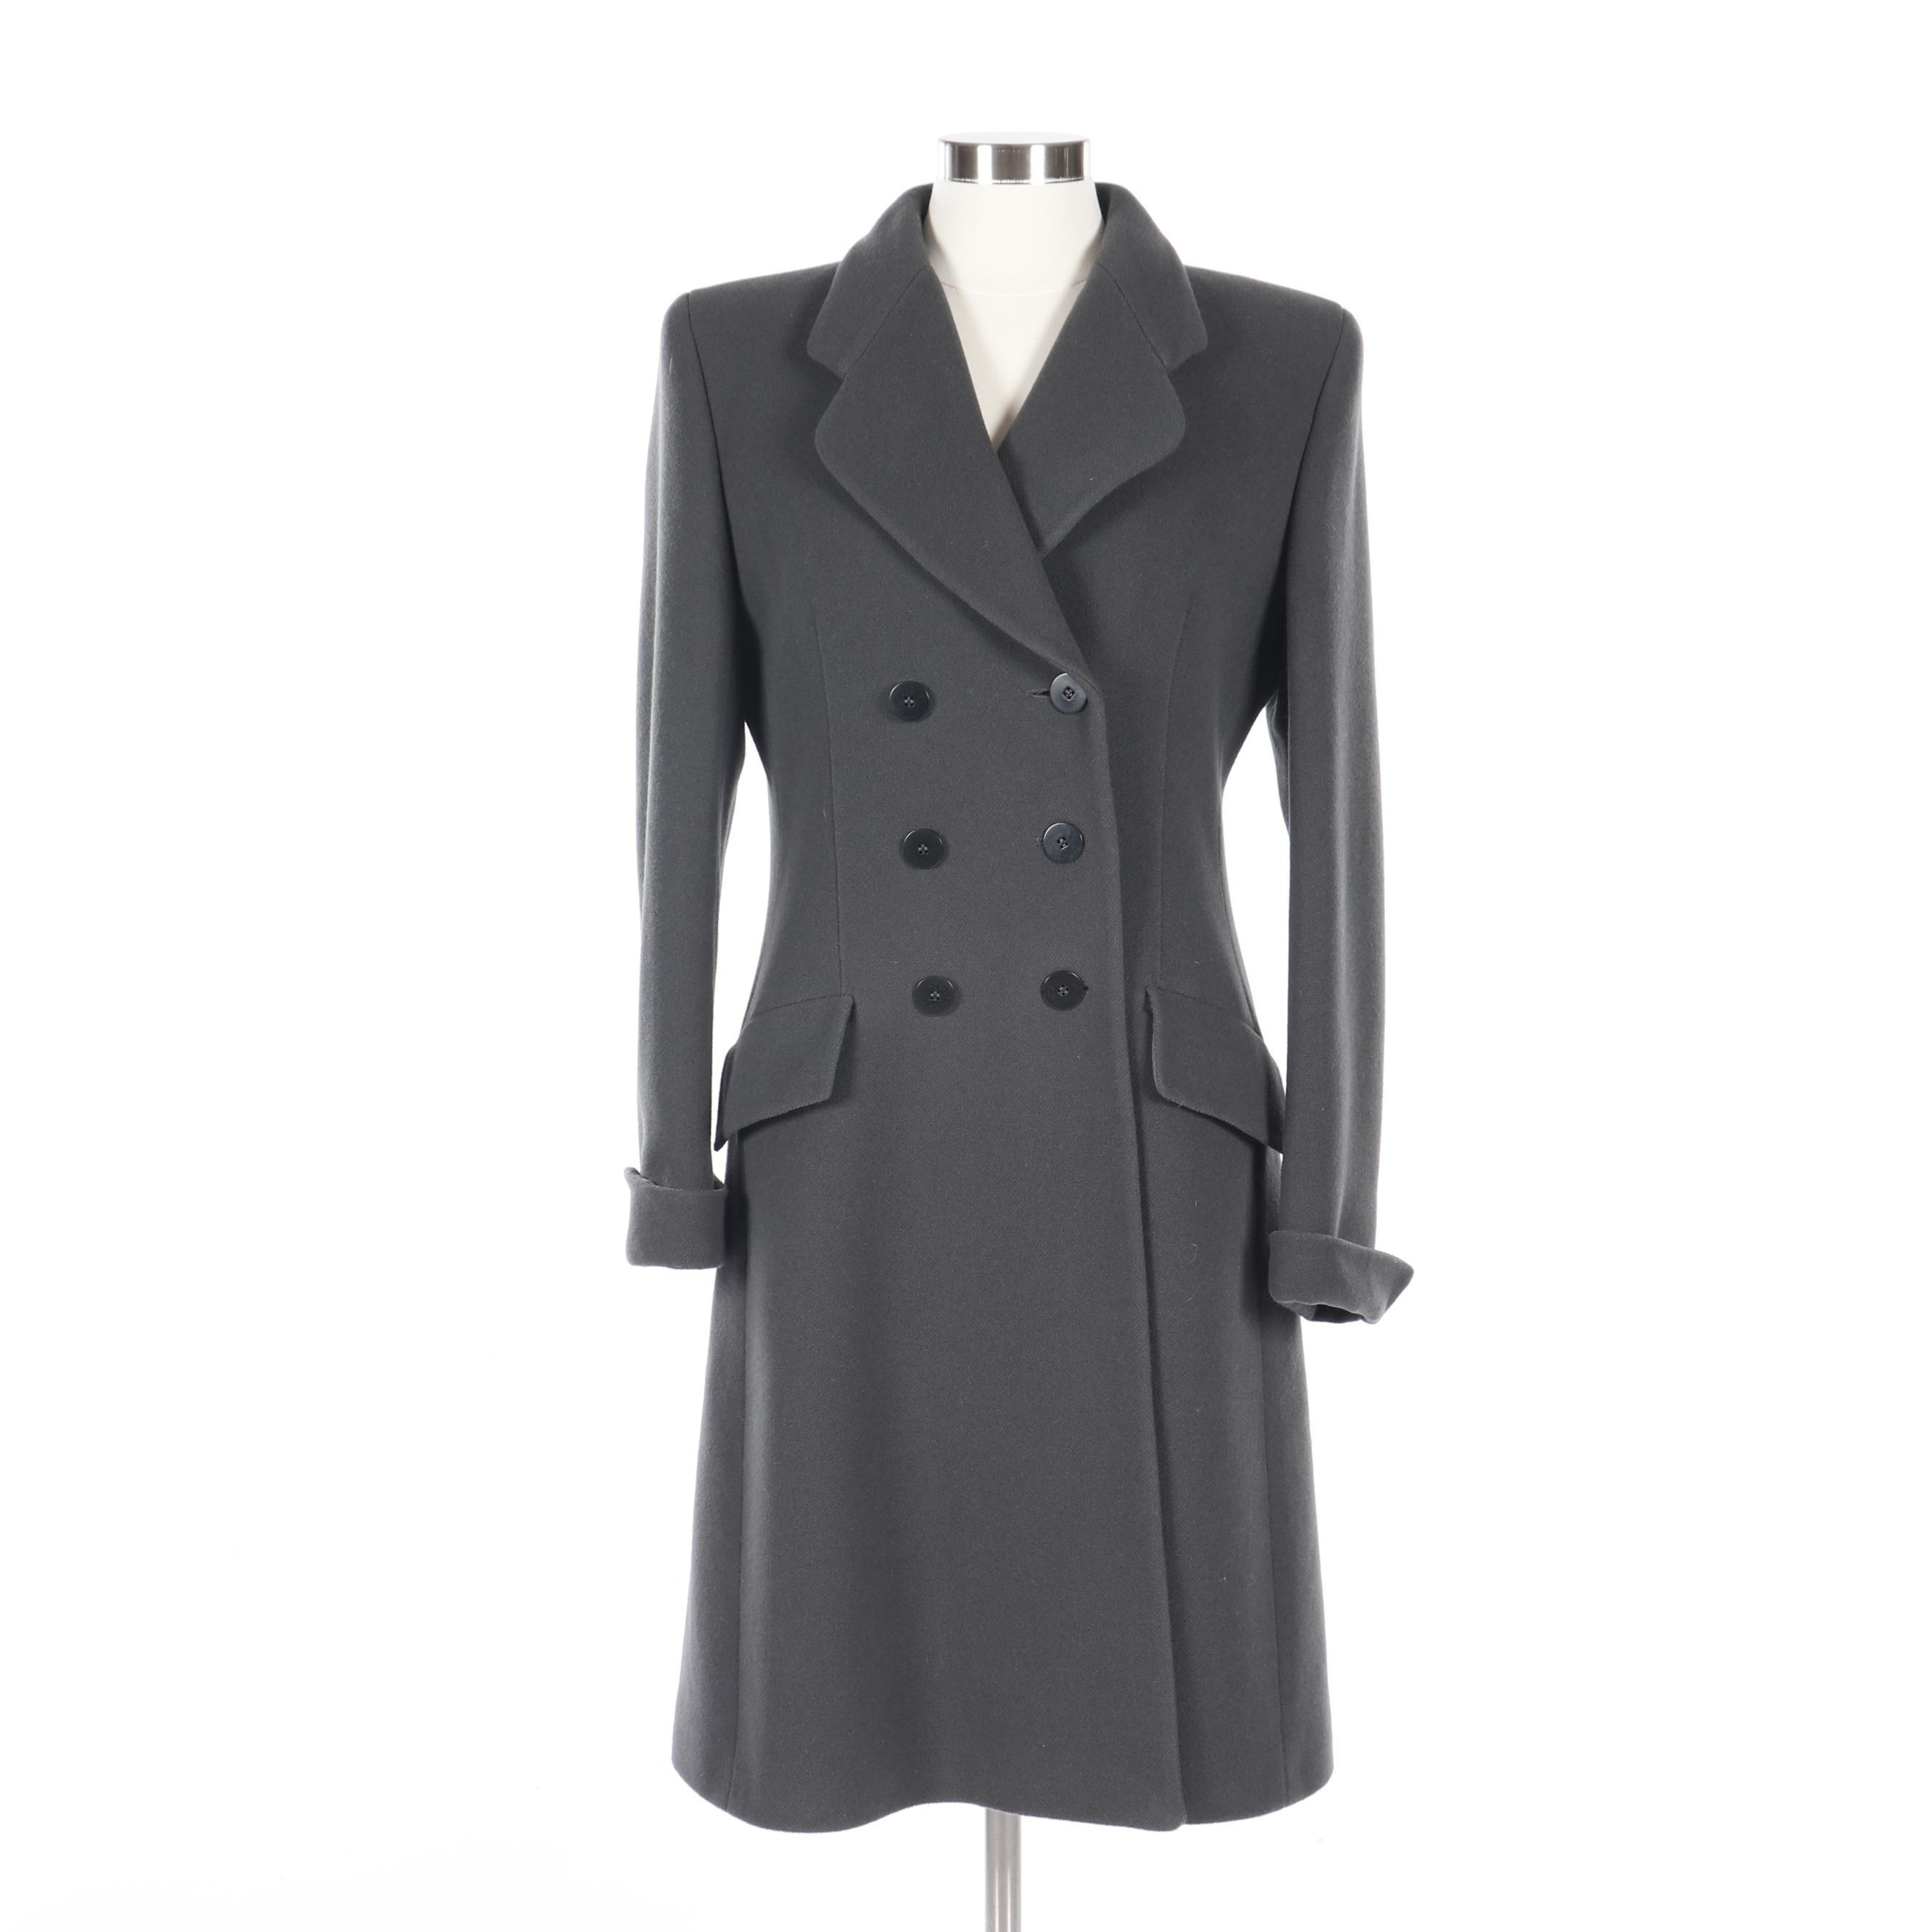 Giorgio Armani Le Collezioni Double-Breasted Grey Wool Blend Princess Coat